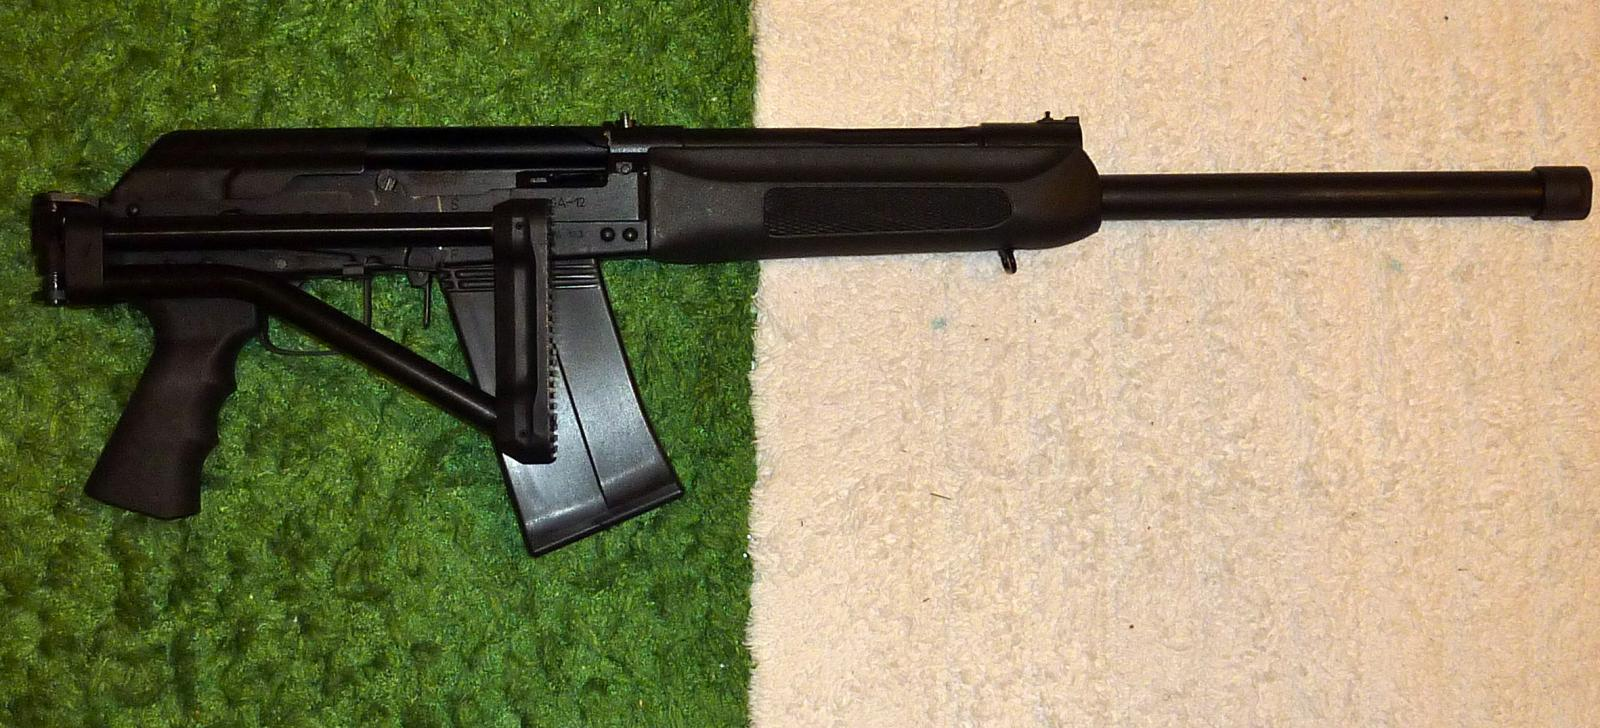 Bonesteel Arms folding stock for Saiga 12 - First Impressions